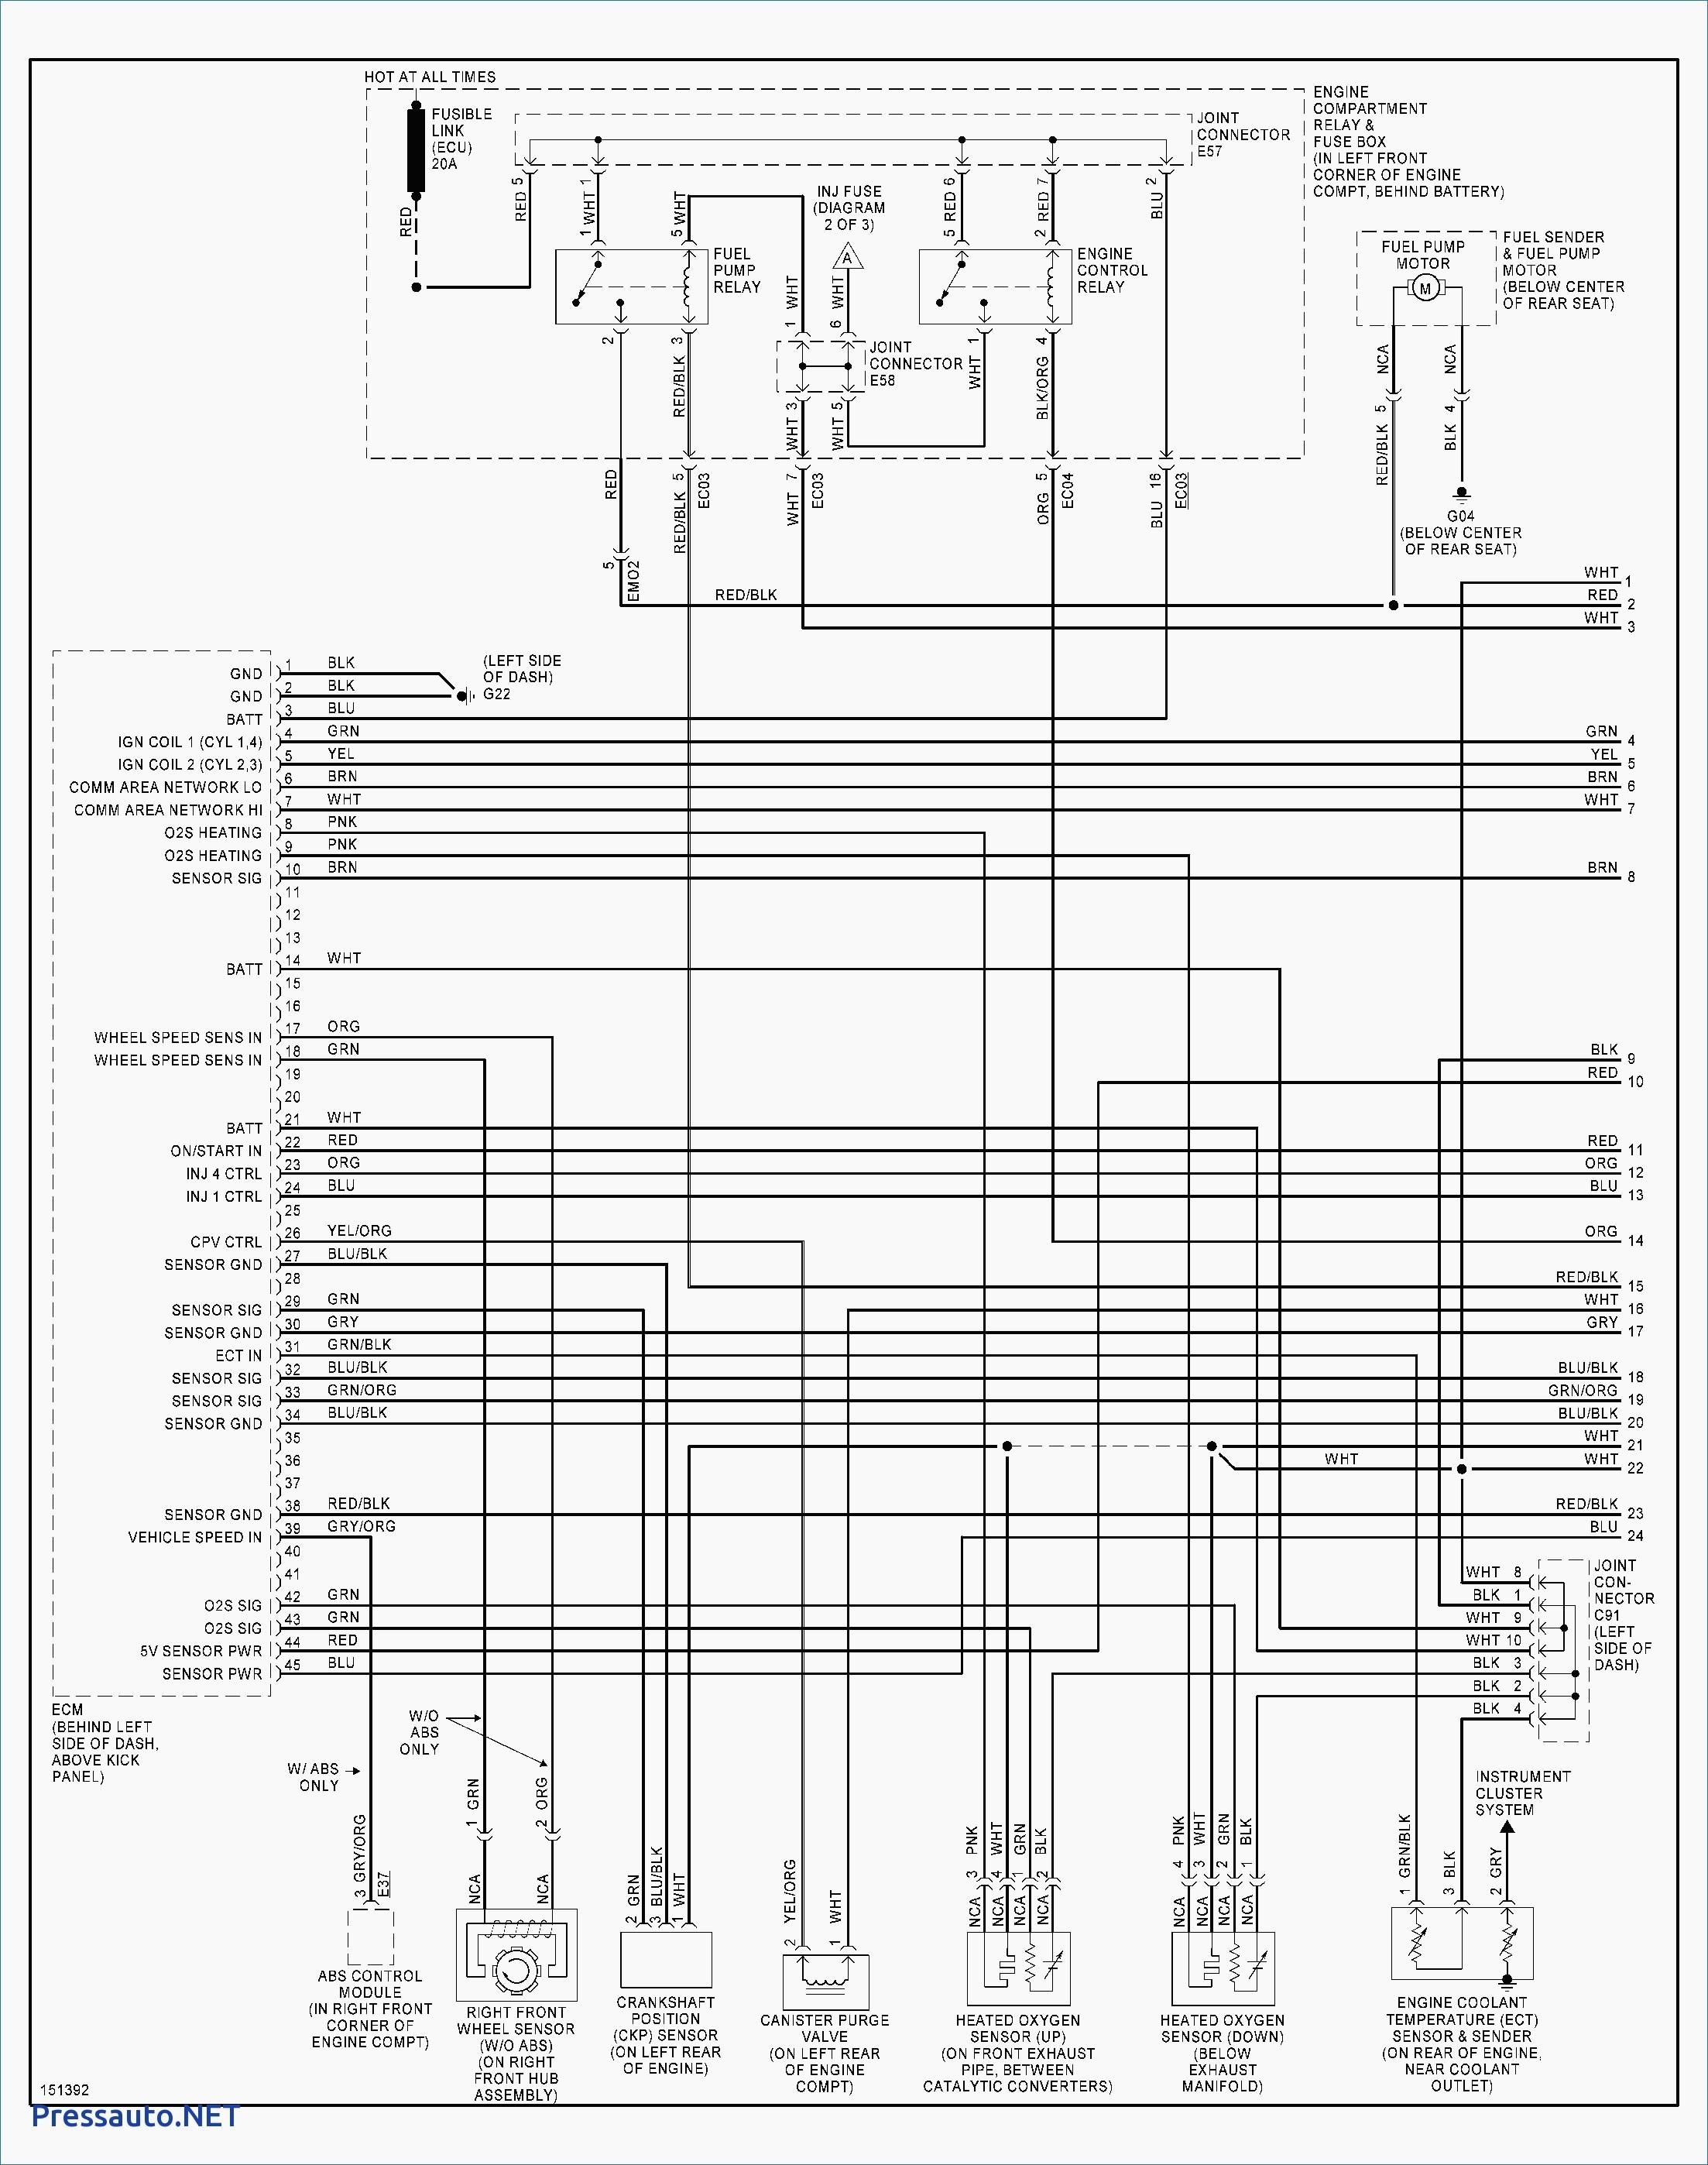 1997 Hyundai Accent Wiring Diagram